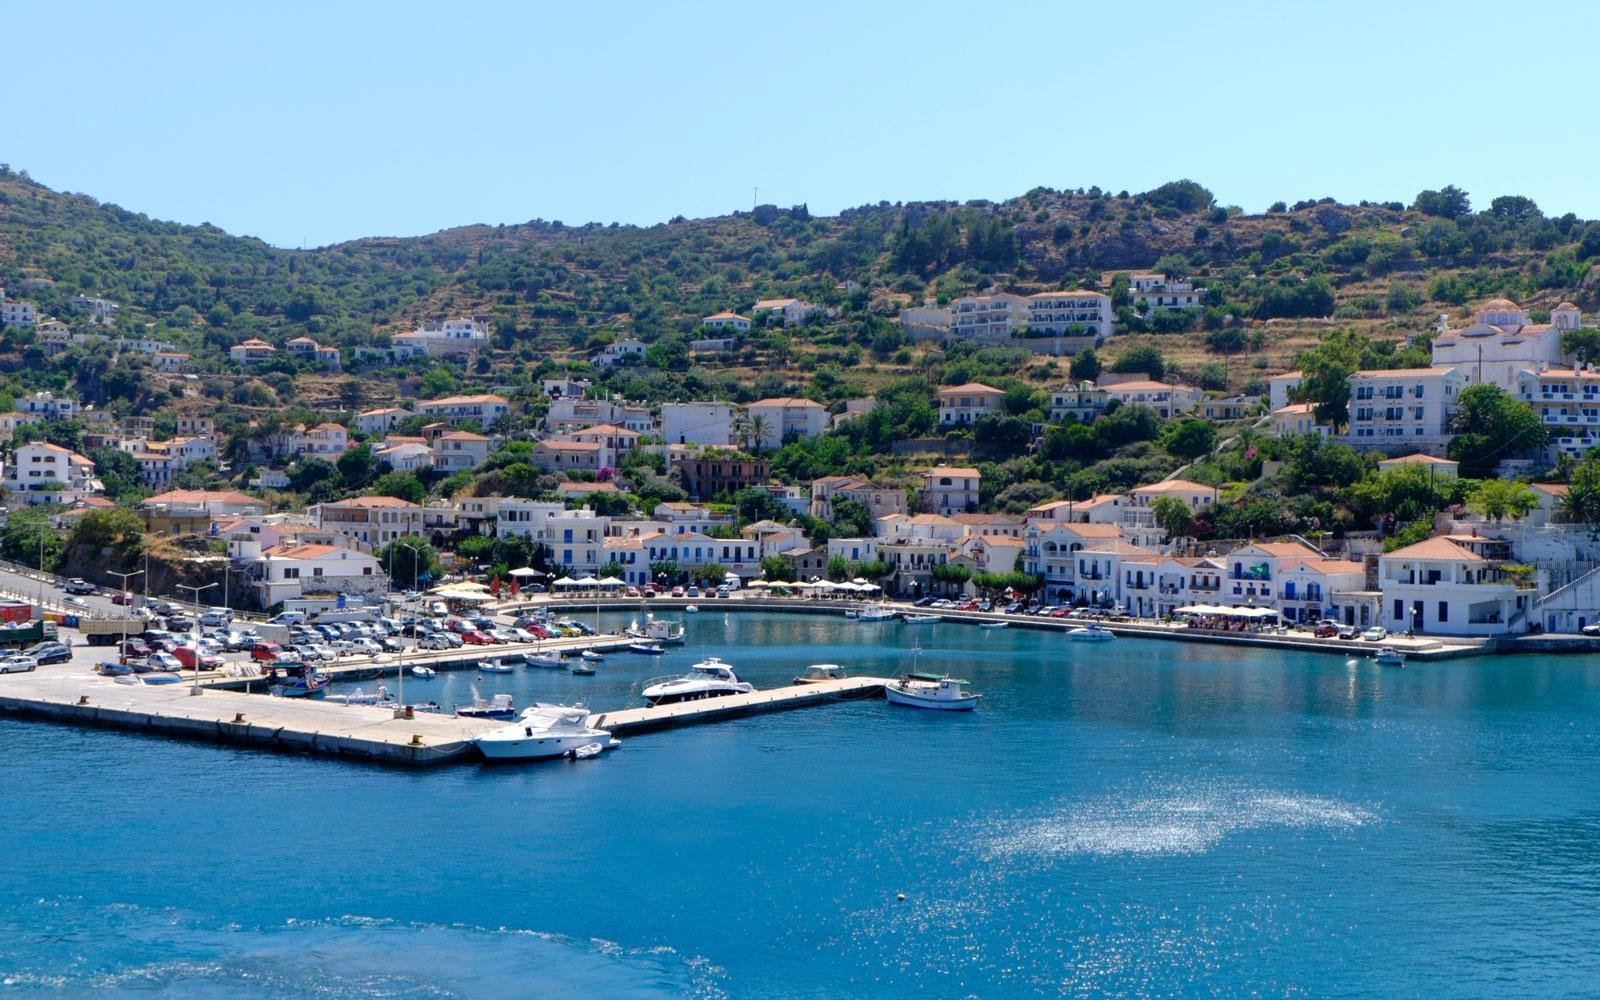 201206 w europes secret hotspots ikaria greece